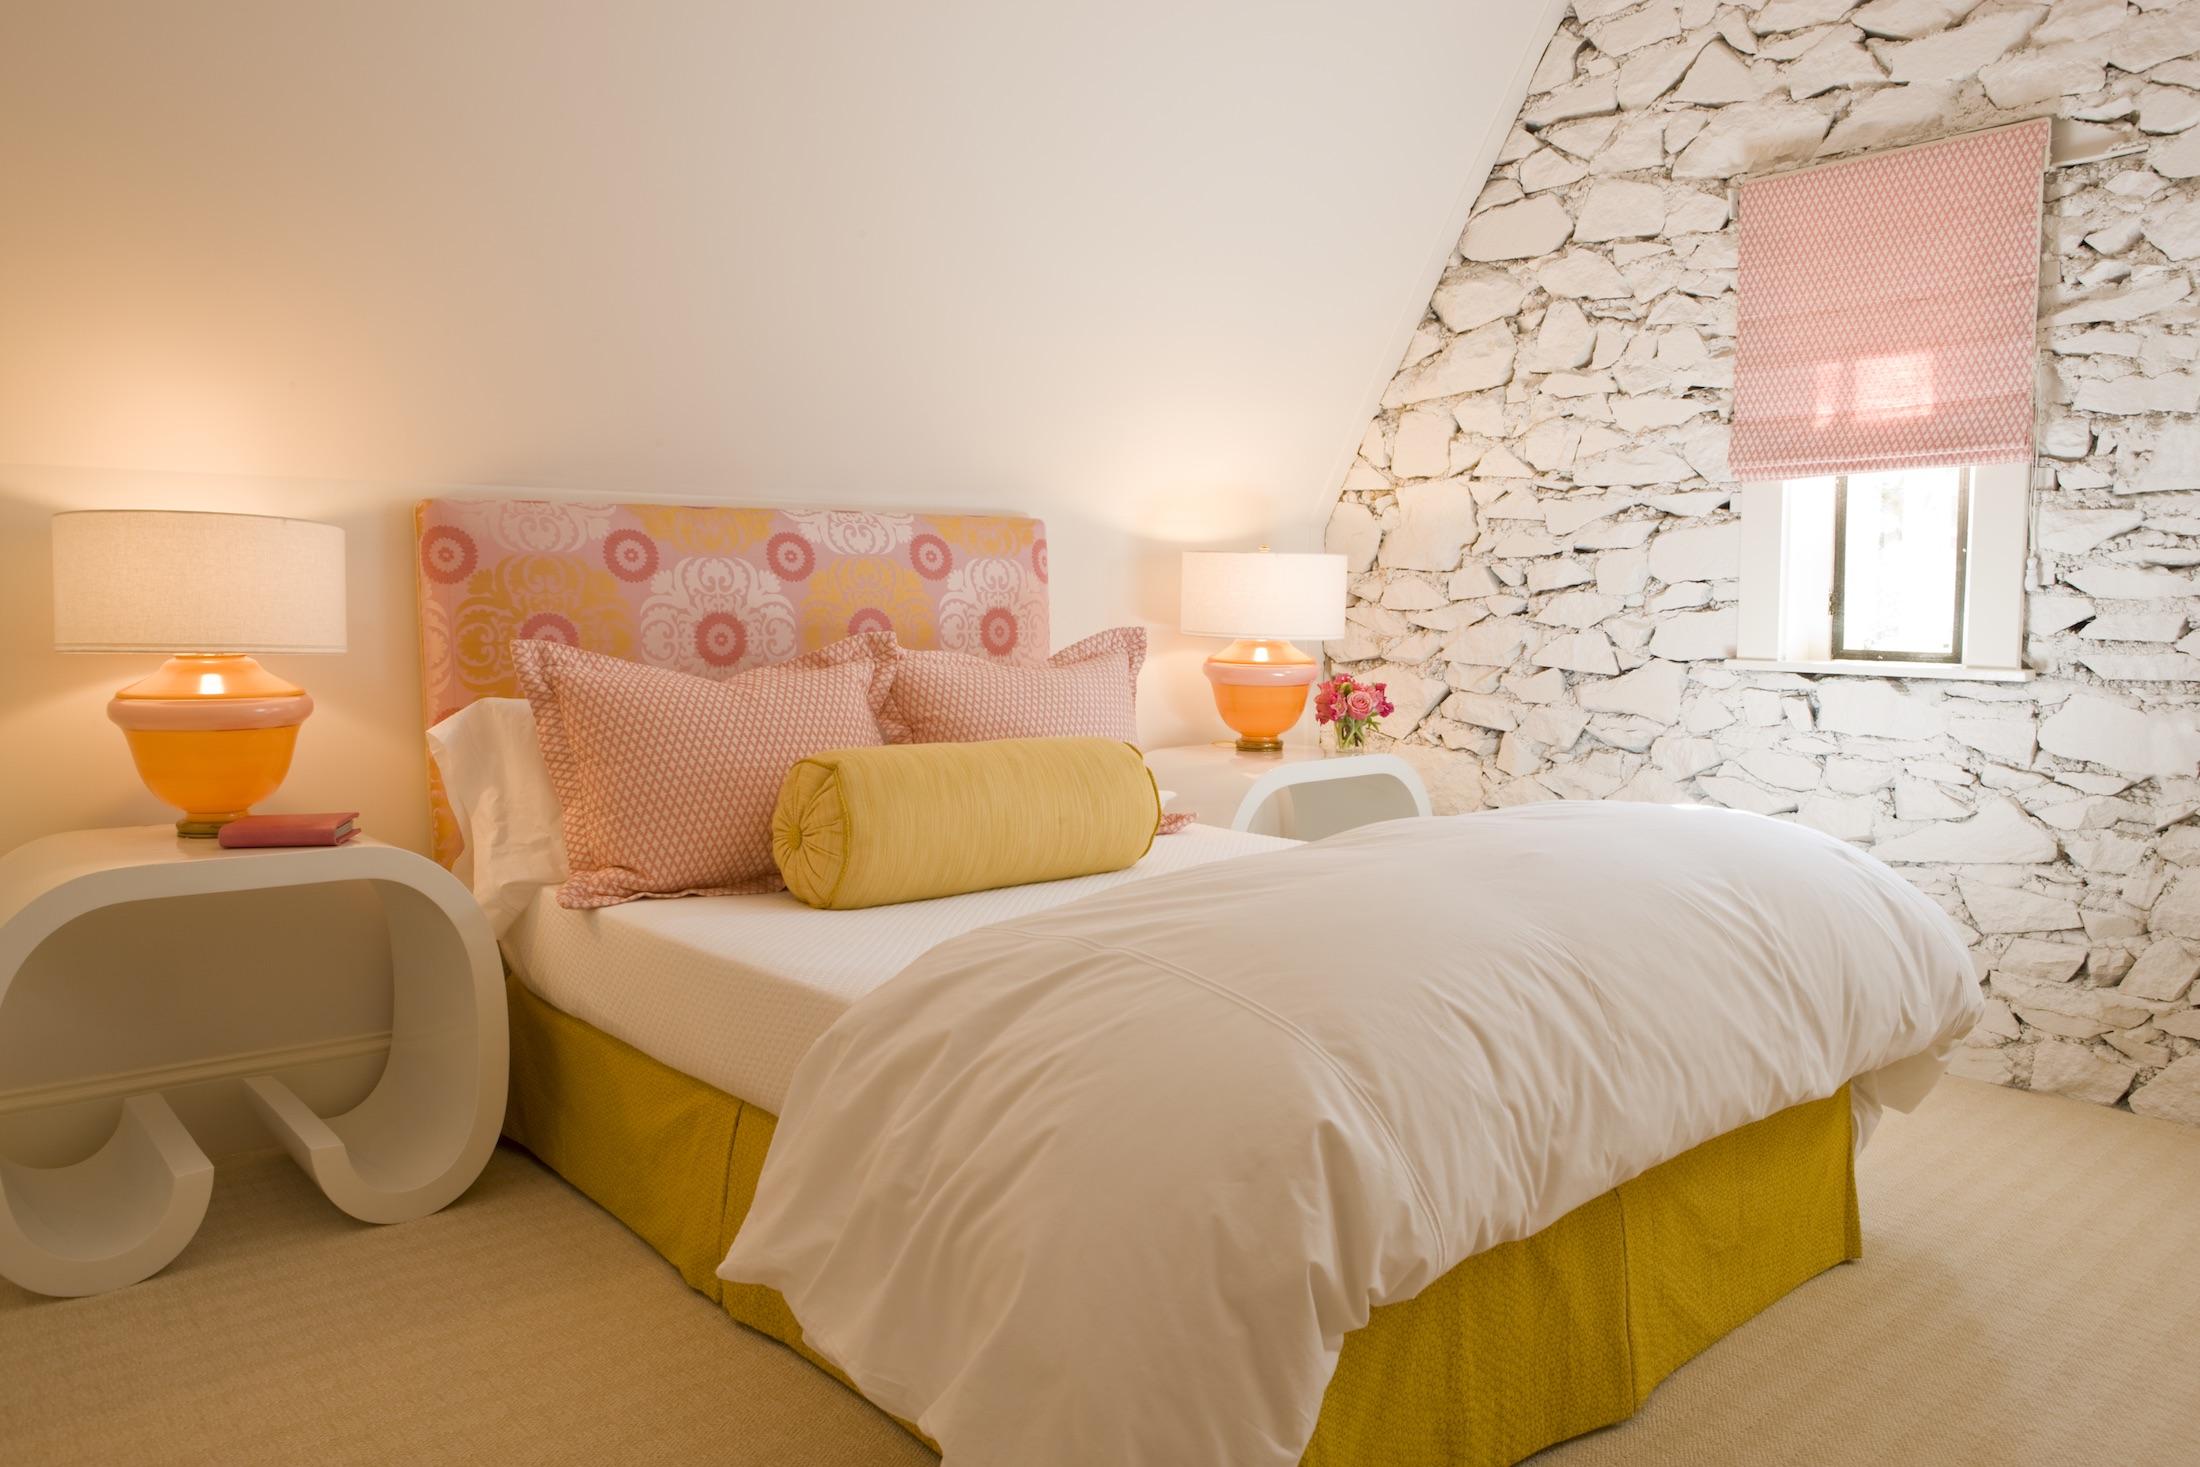 WDC 011 Annie's room.jpeg